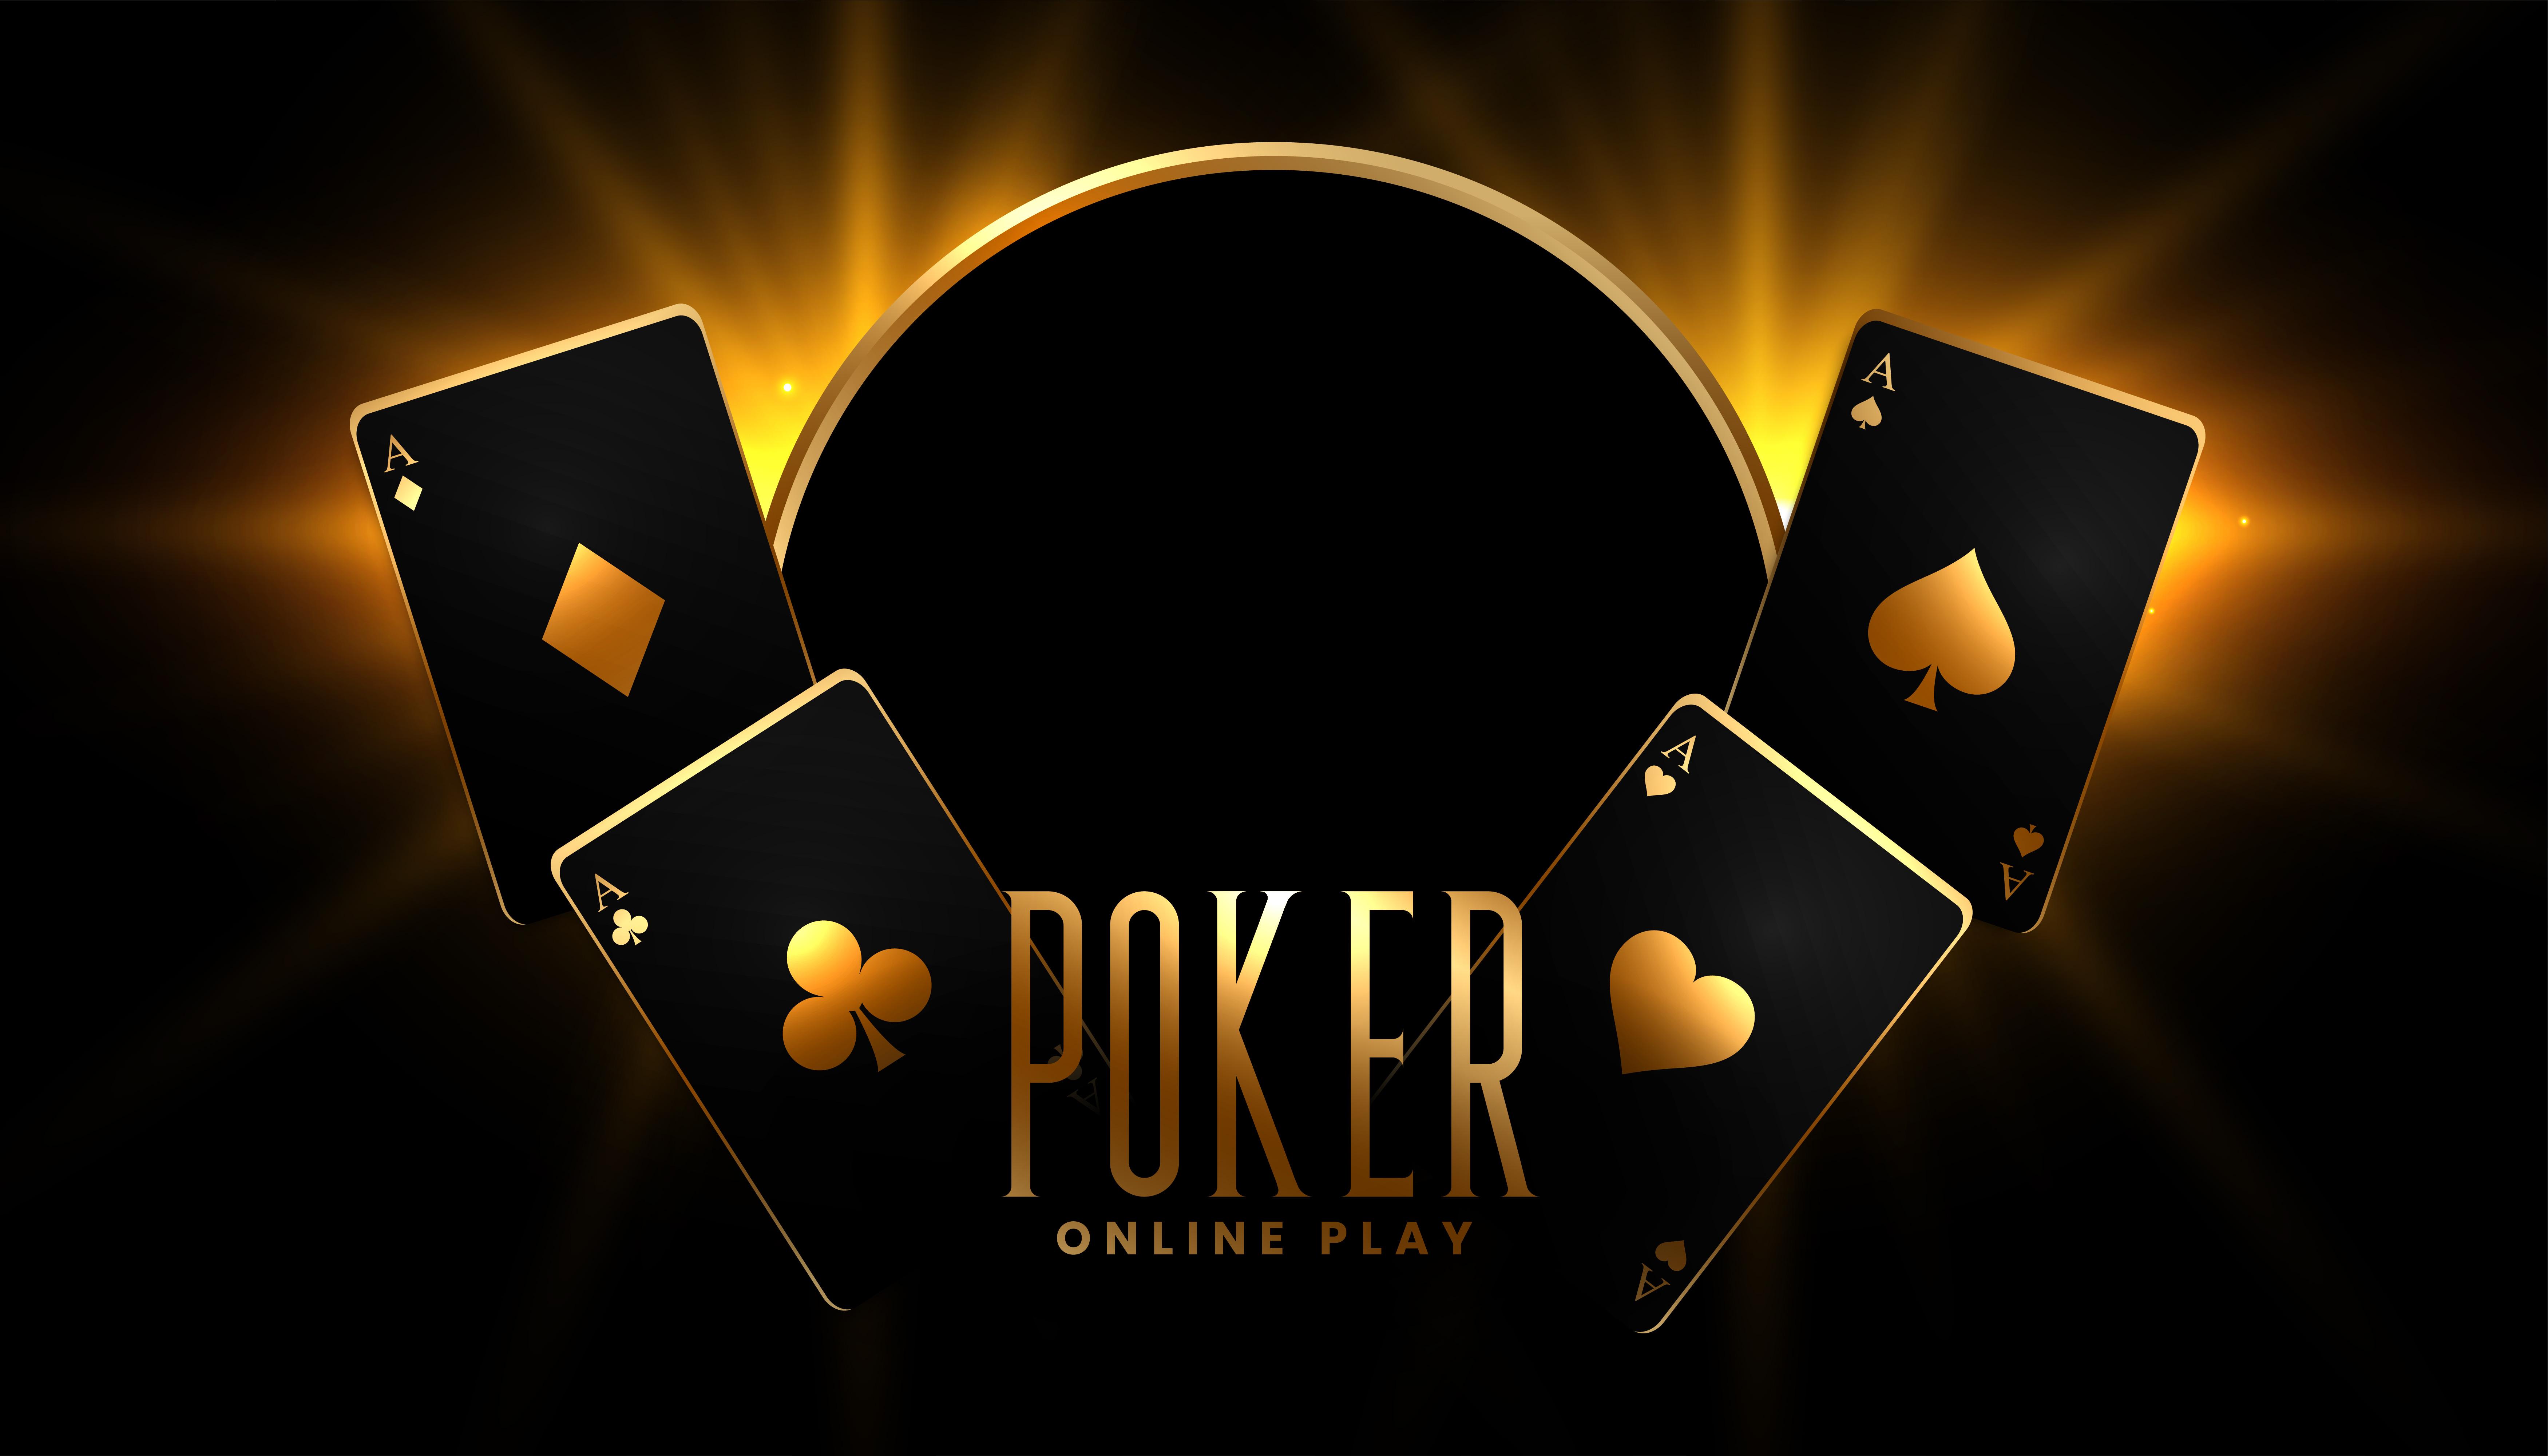 Agen Judi Bola Casino,  Poker,  Gambling DA 60+ Sites Guaranteed Google 1st Page